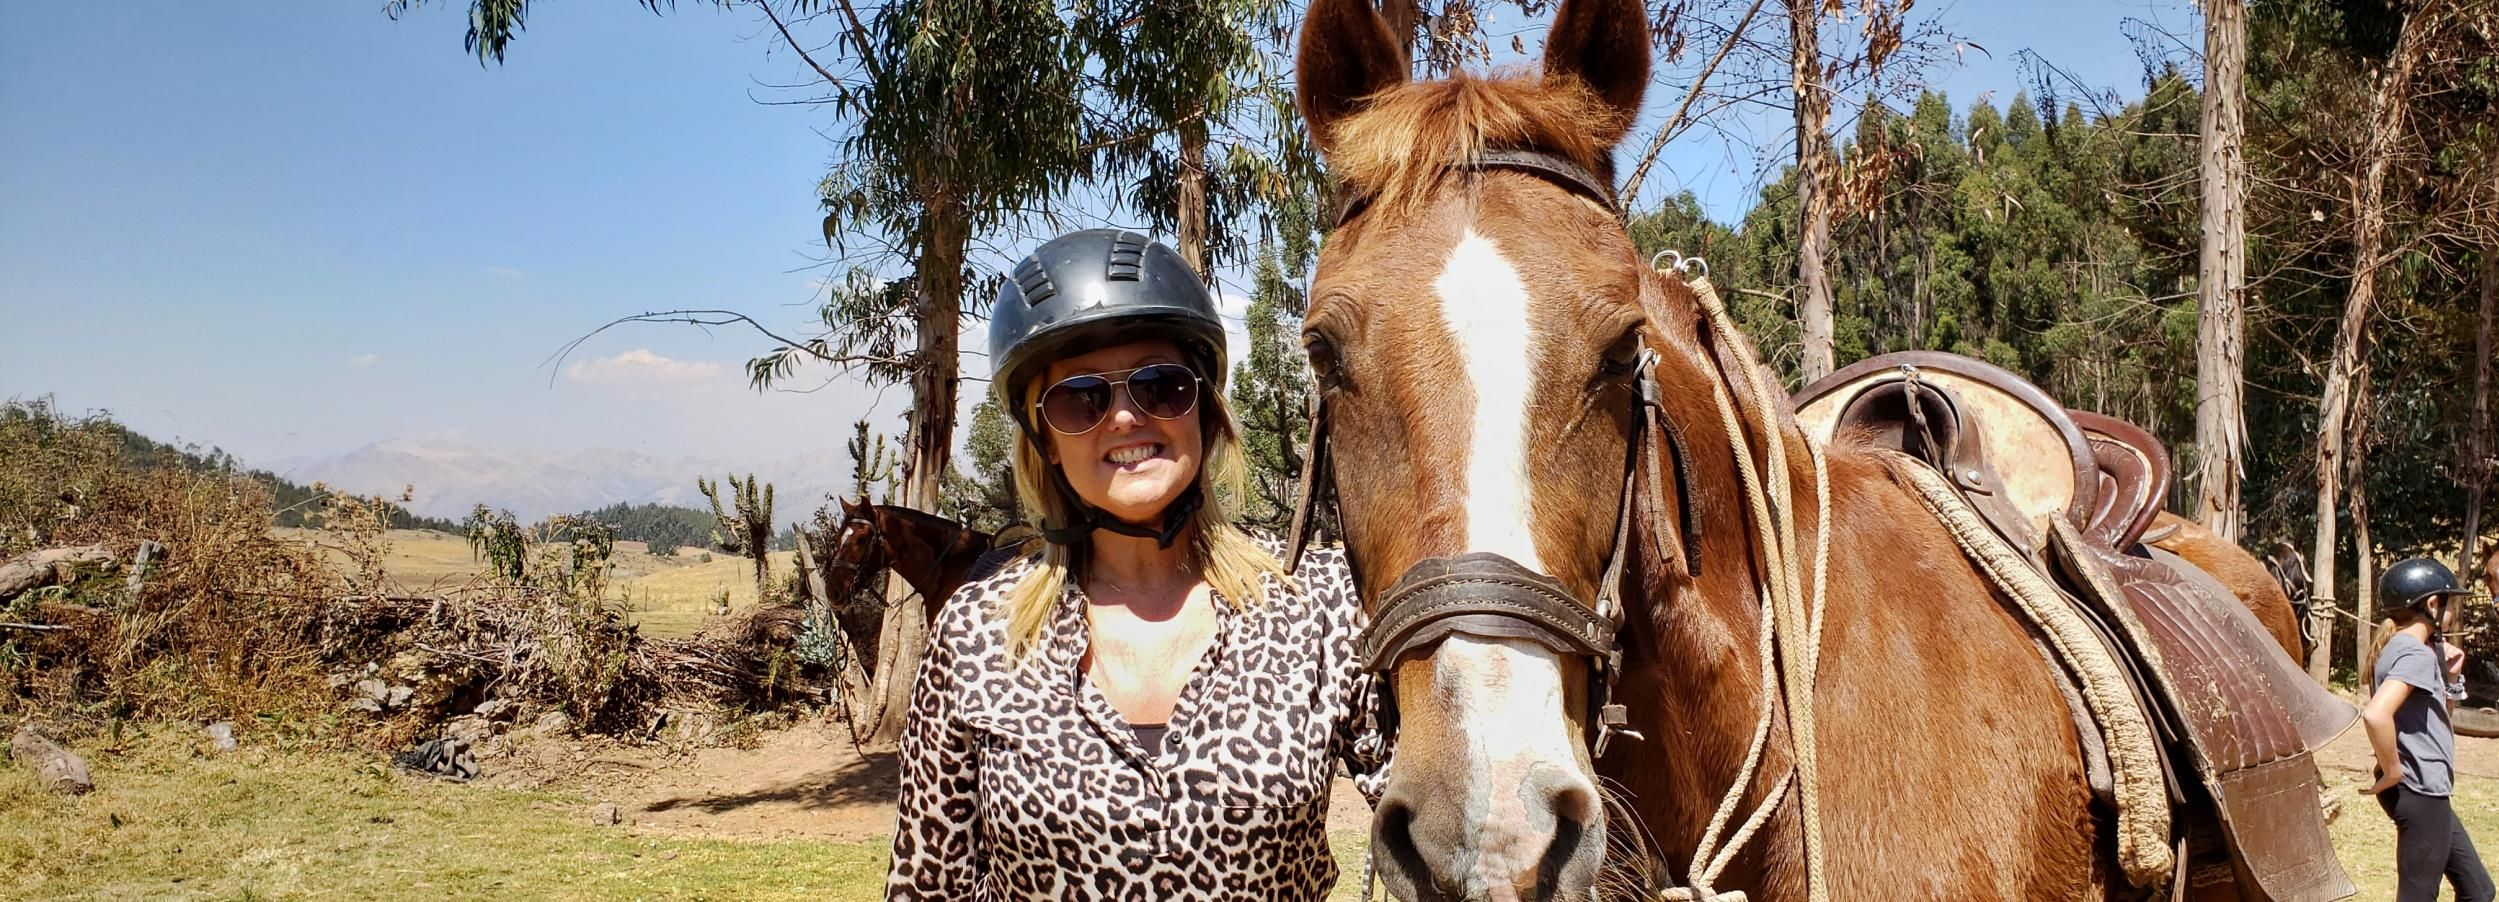 Cusco: Cavalgada de meio dia na varanda do diabo